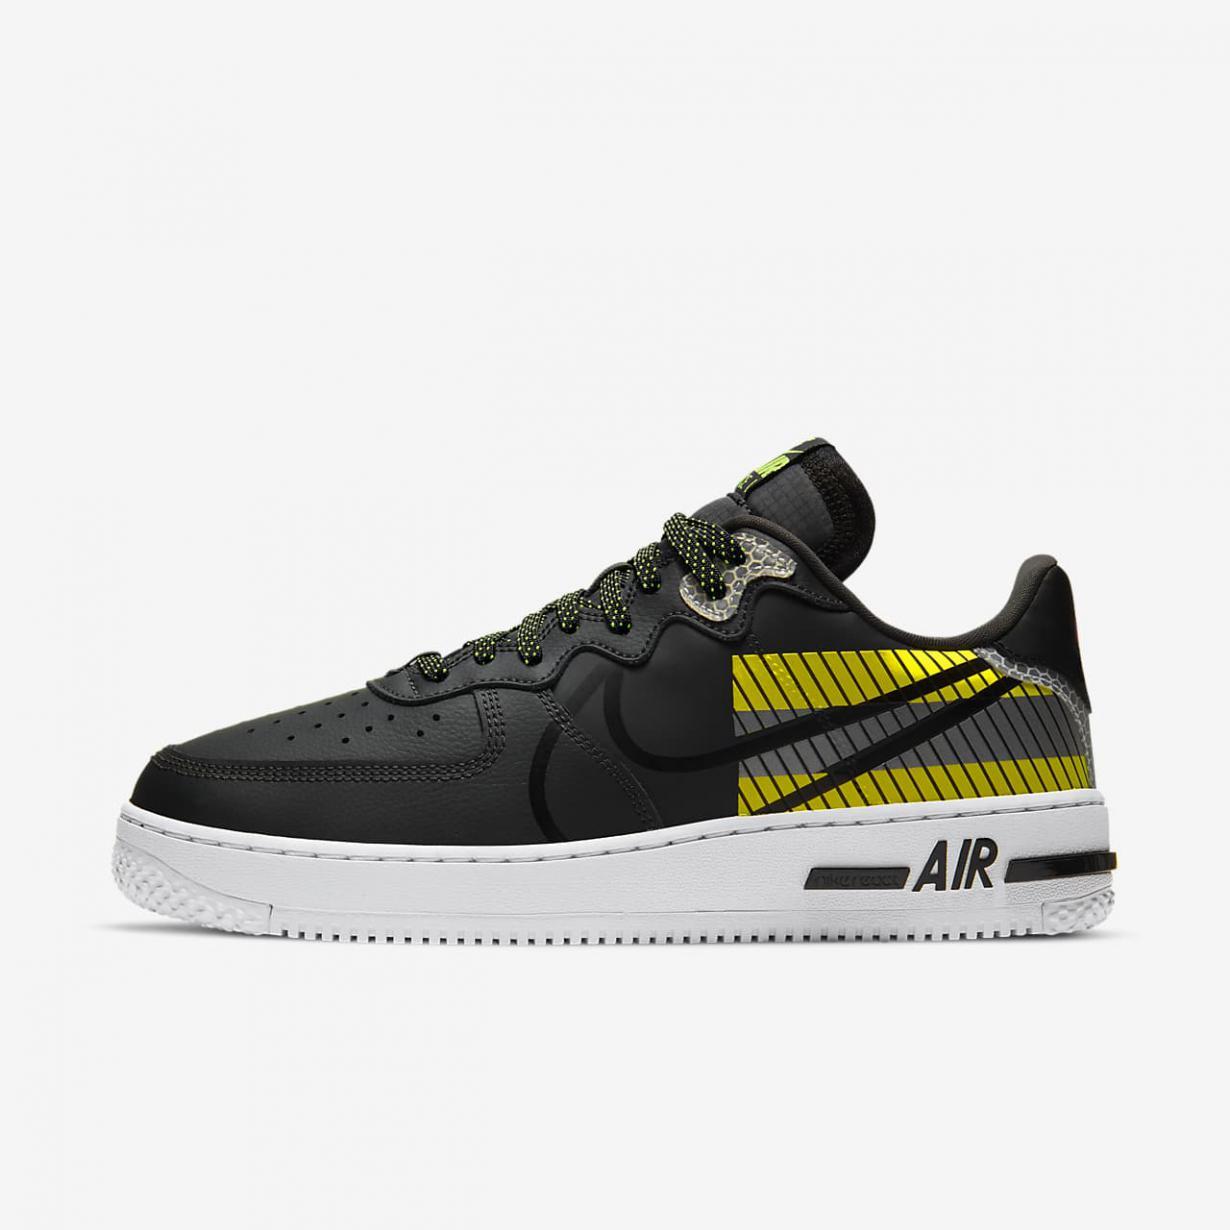 Nike Air Force 1 < Nike En Ligne Pas Cher Vente - FR ...